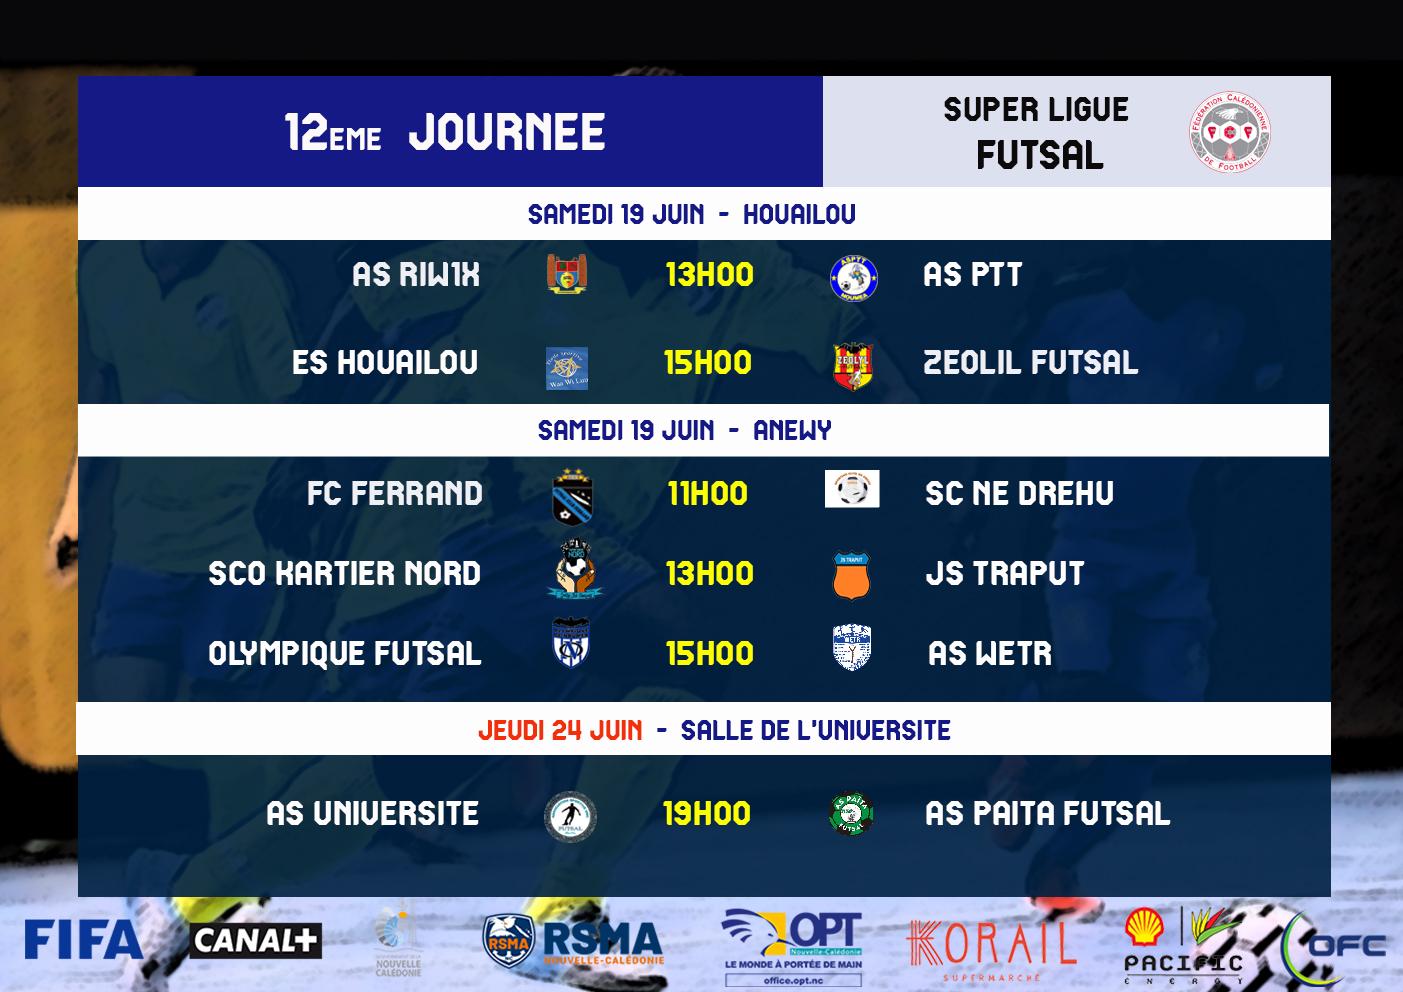 Programme du week-end / SUPER LIGUE (J13) - SUPER LIGUE FUTSAL (J12)